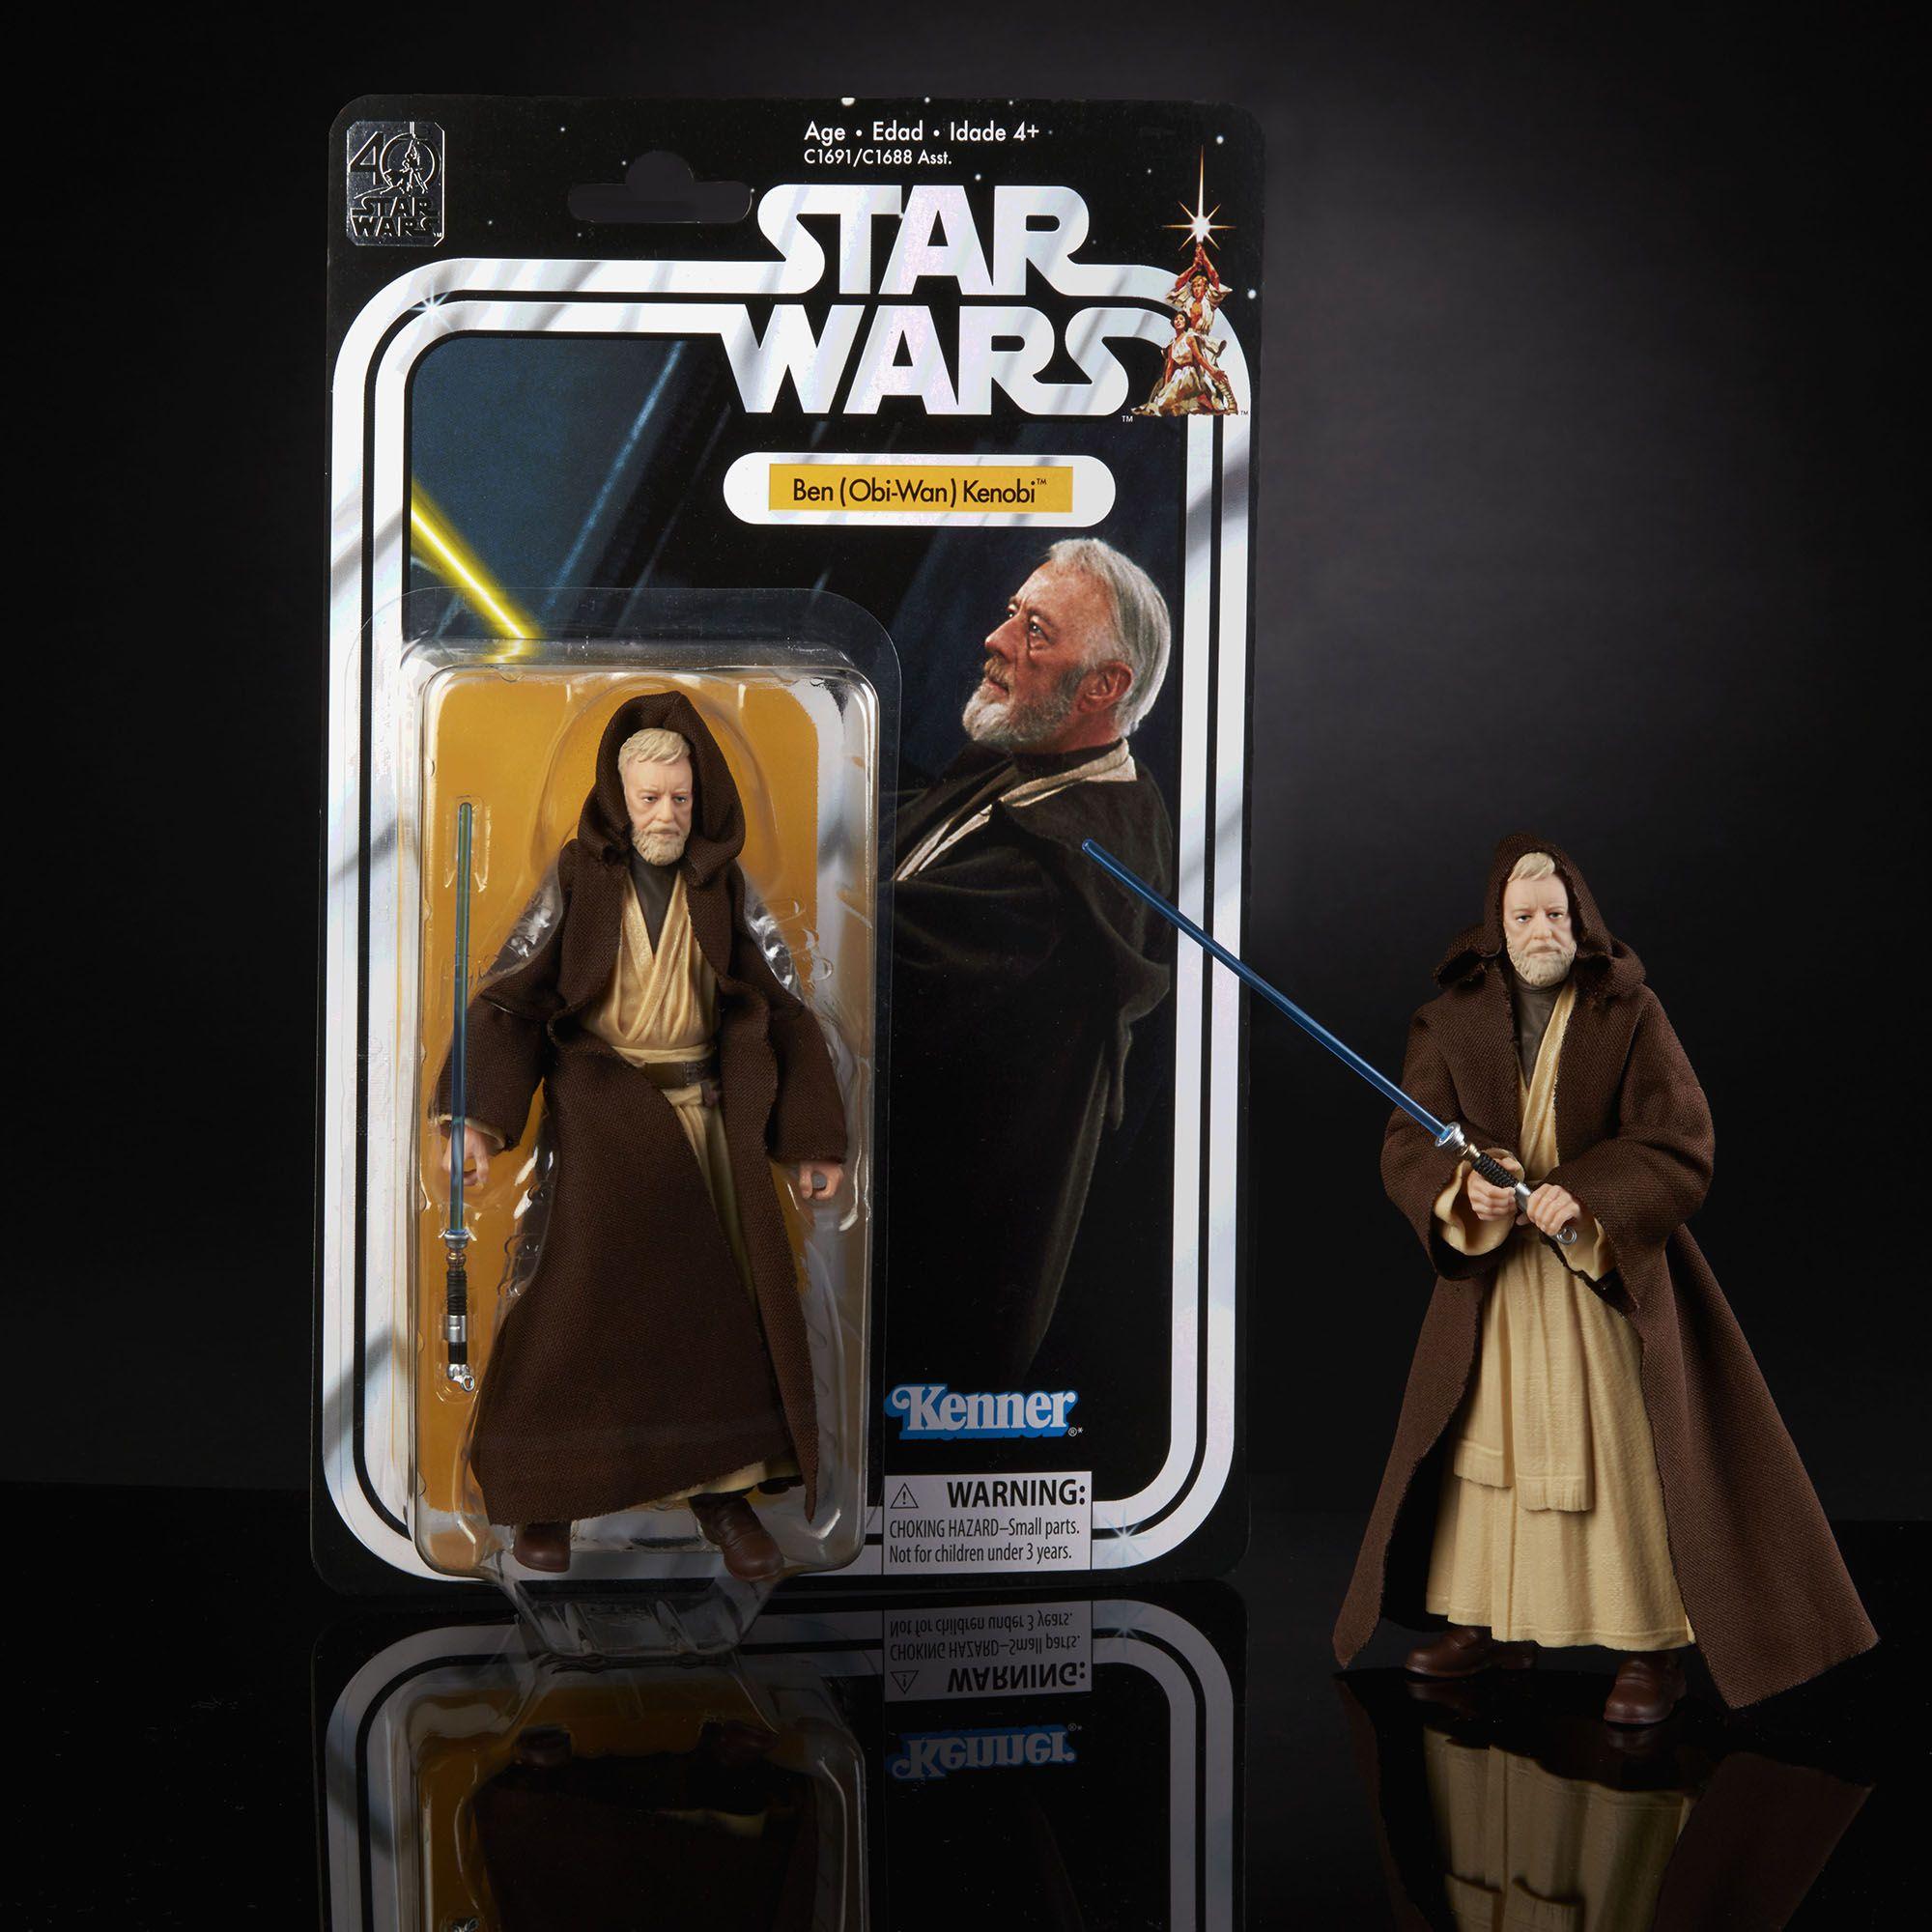 Star Wars The Black Series 77 Kenner Carded Figures 40th Anniversary Ben Obi Wan Kenobi Star Wars Figures Star Wars Toys Star Wars Black Series